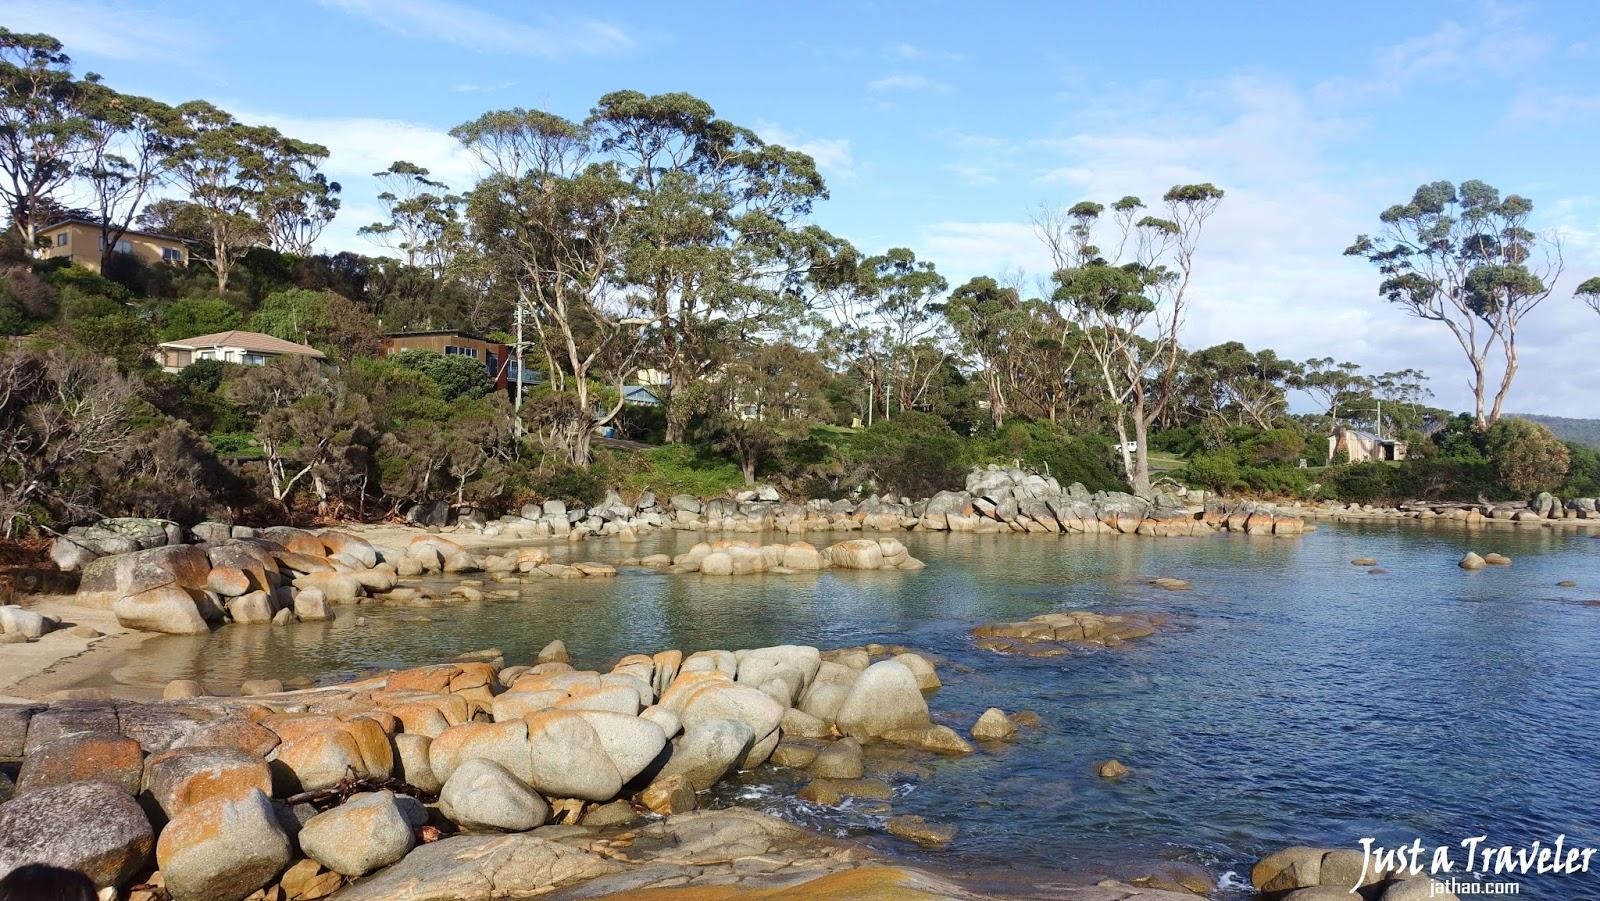 塔斯馬尼亞-景點-推薦-火焰灣-自由行-旅遊-澳洲-Tasmania-Tourist-Attraction-Bay-of-Fires-Travel-Australia